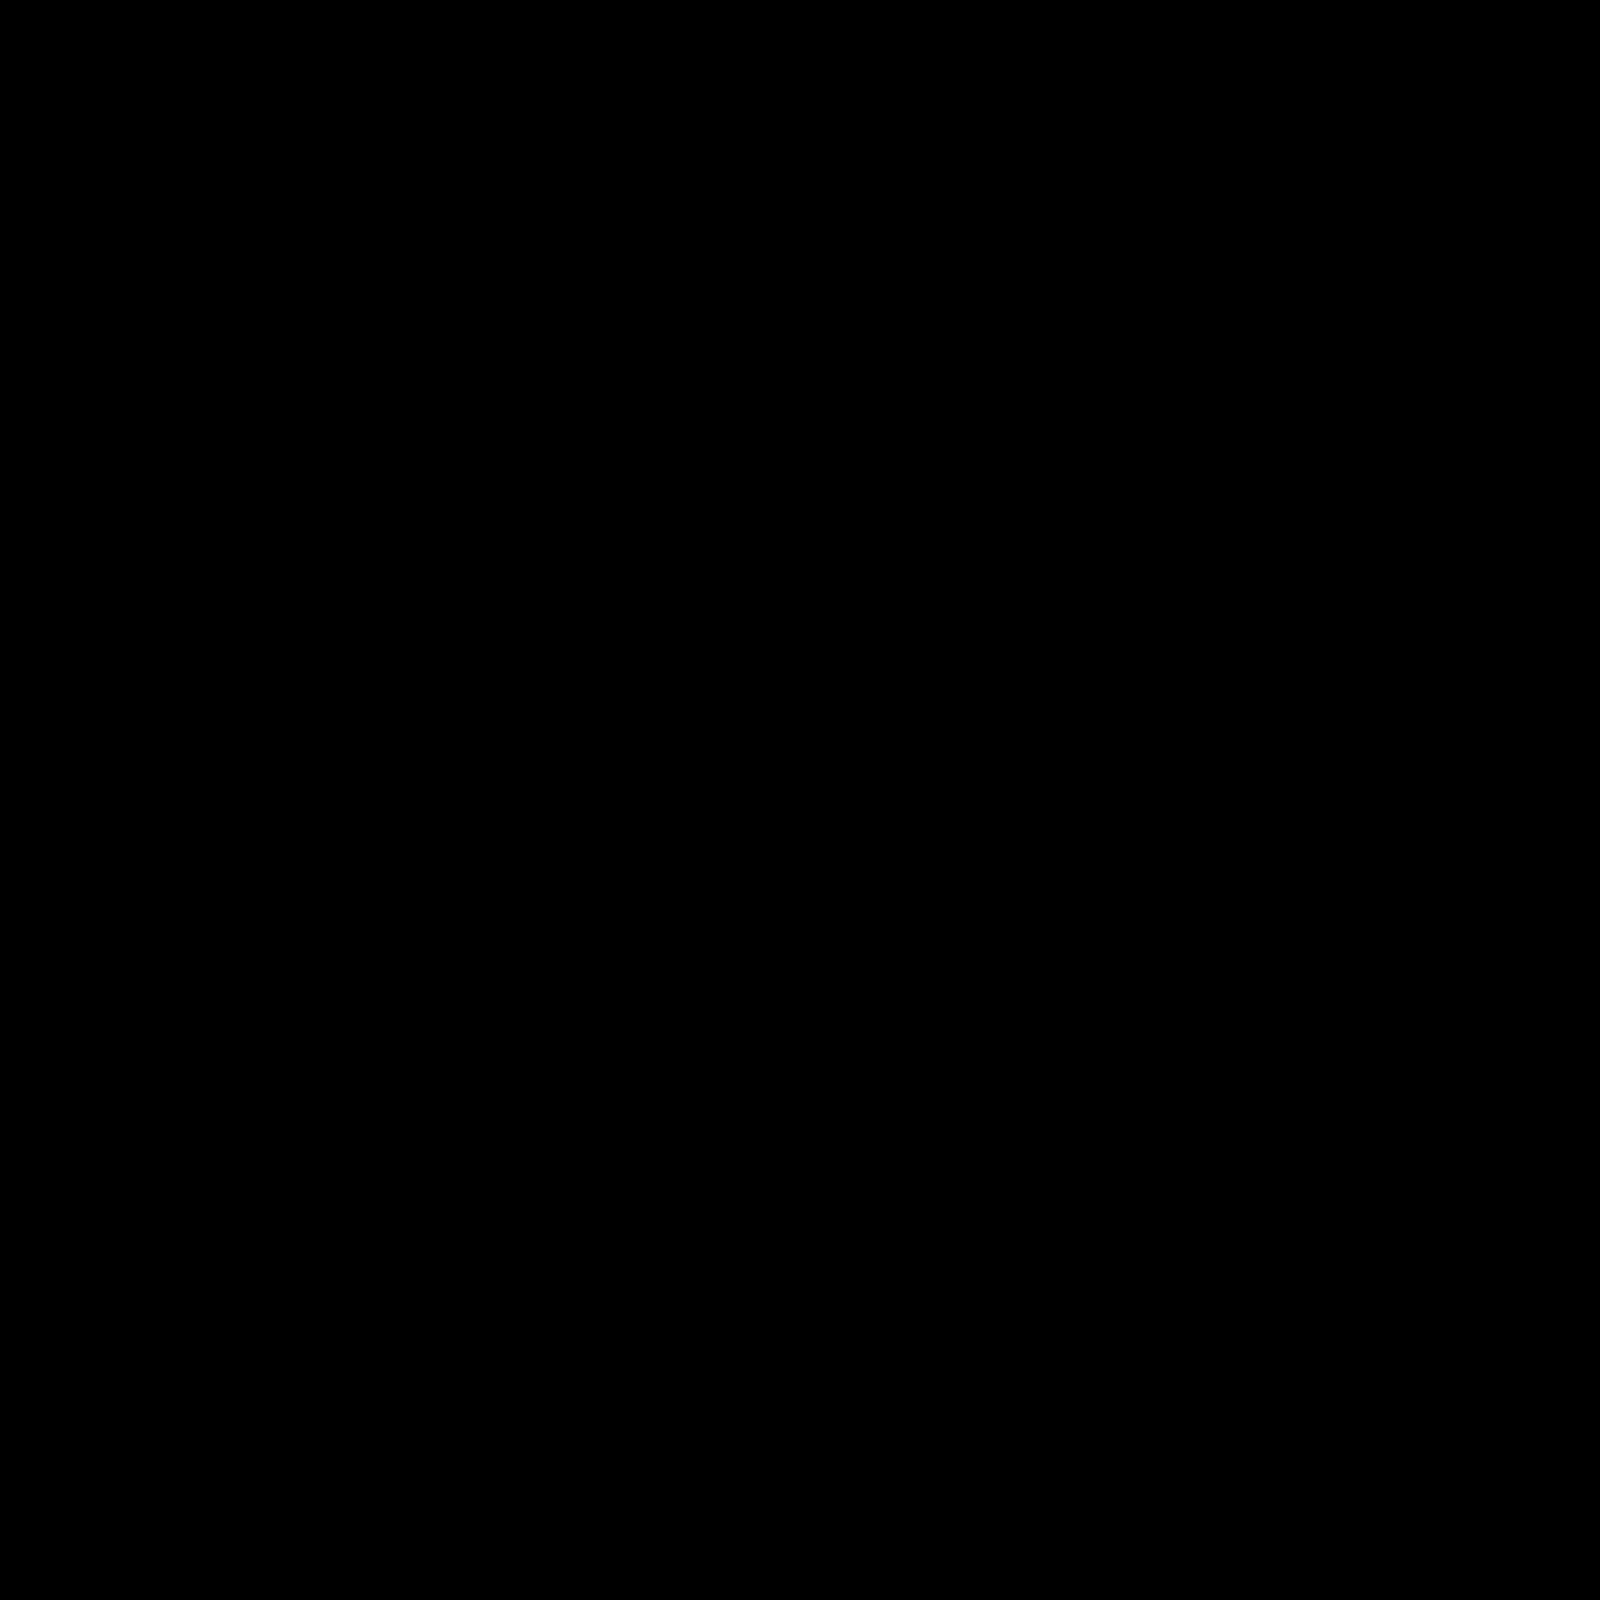 Spectrophotometer icon